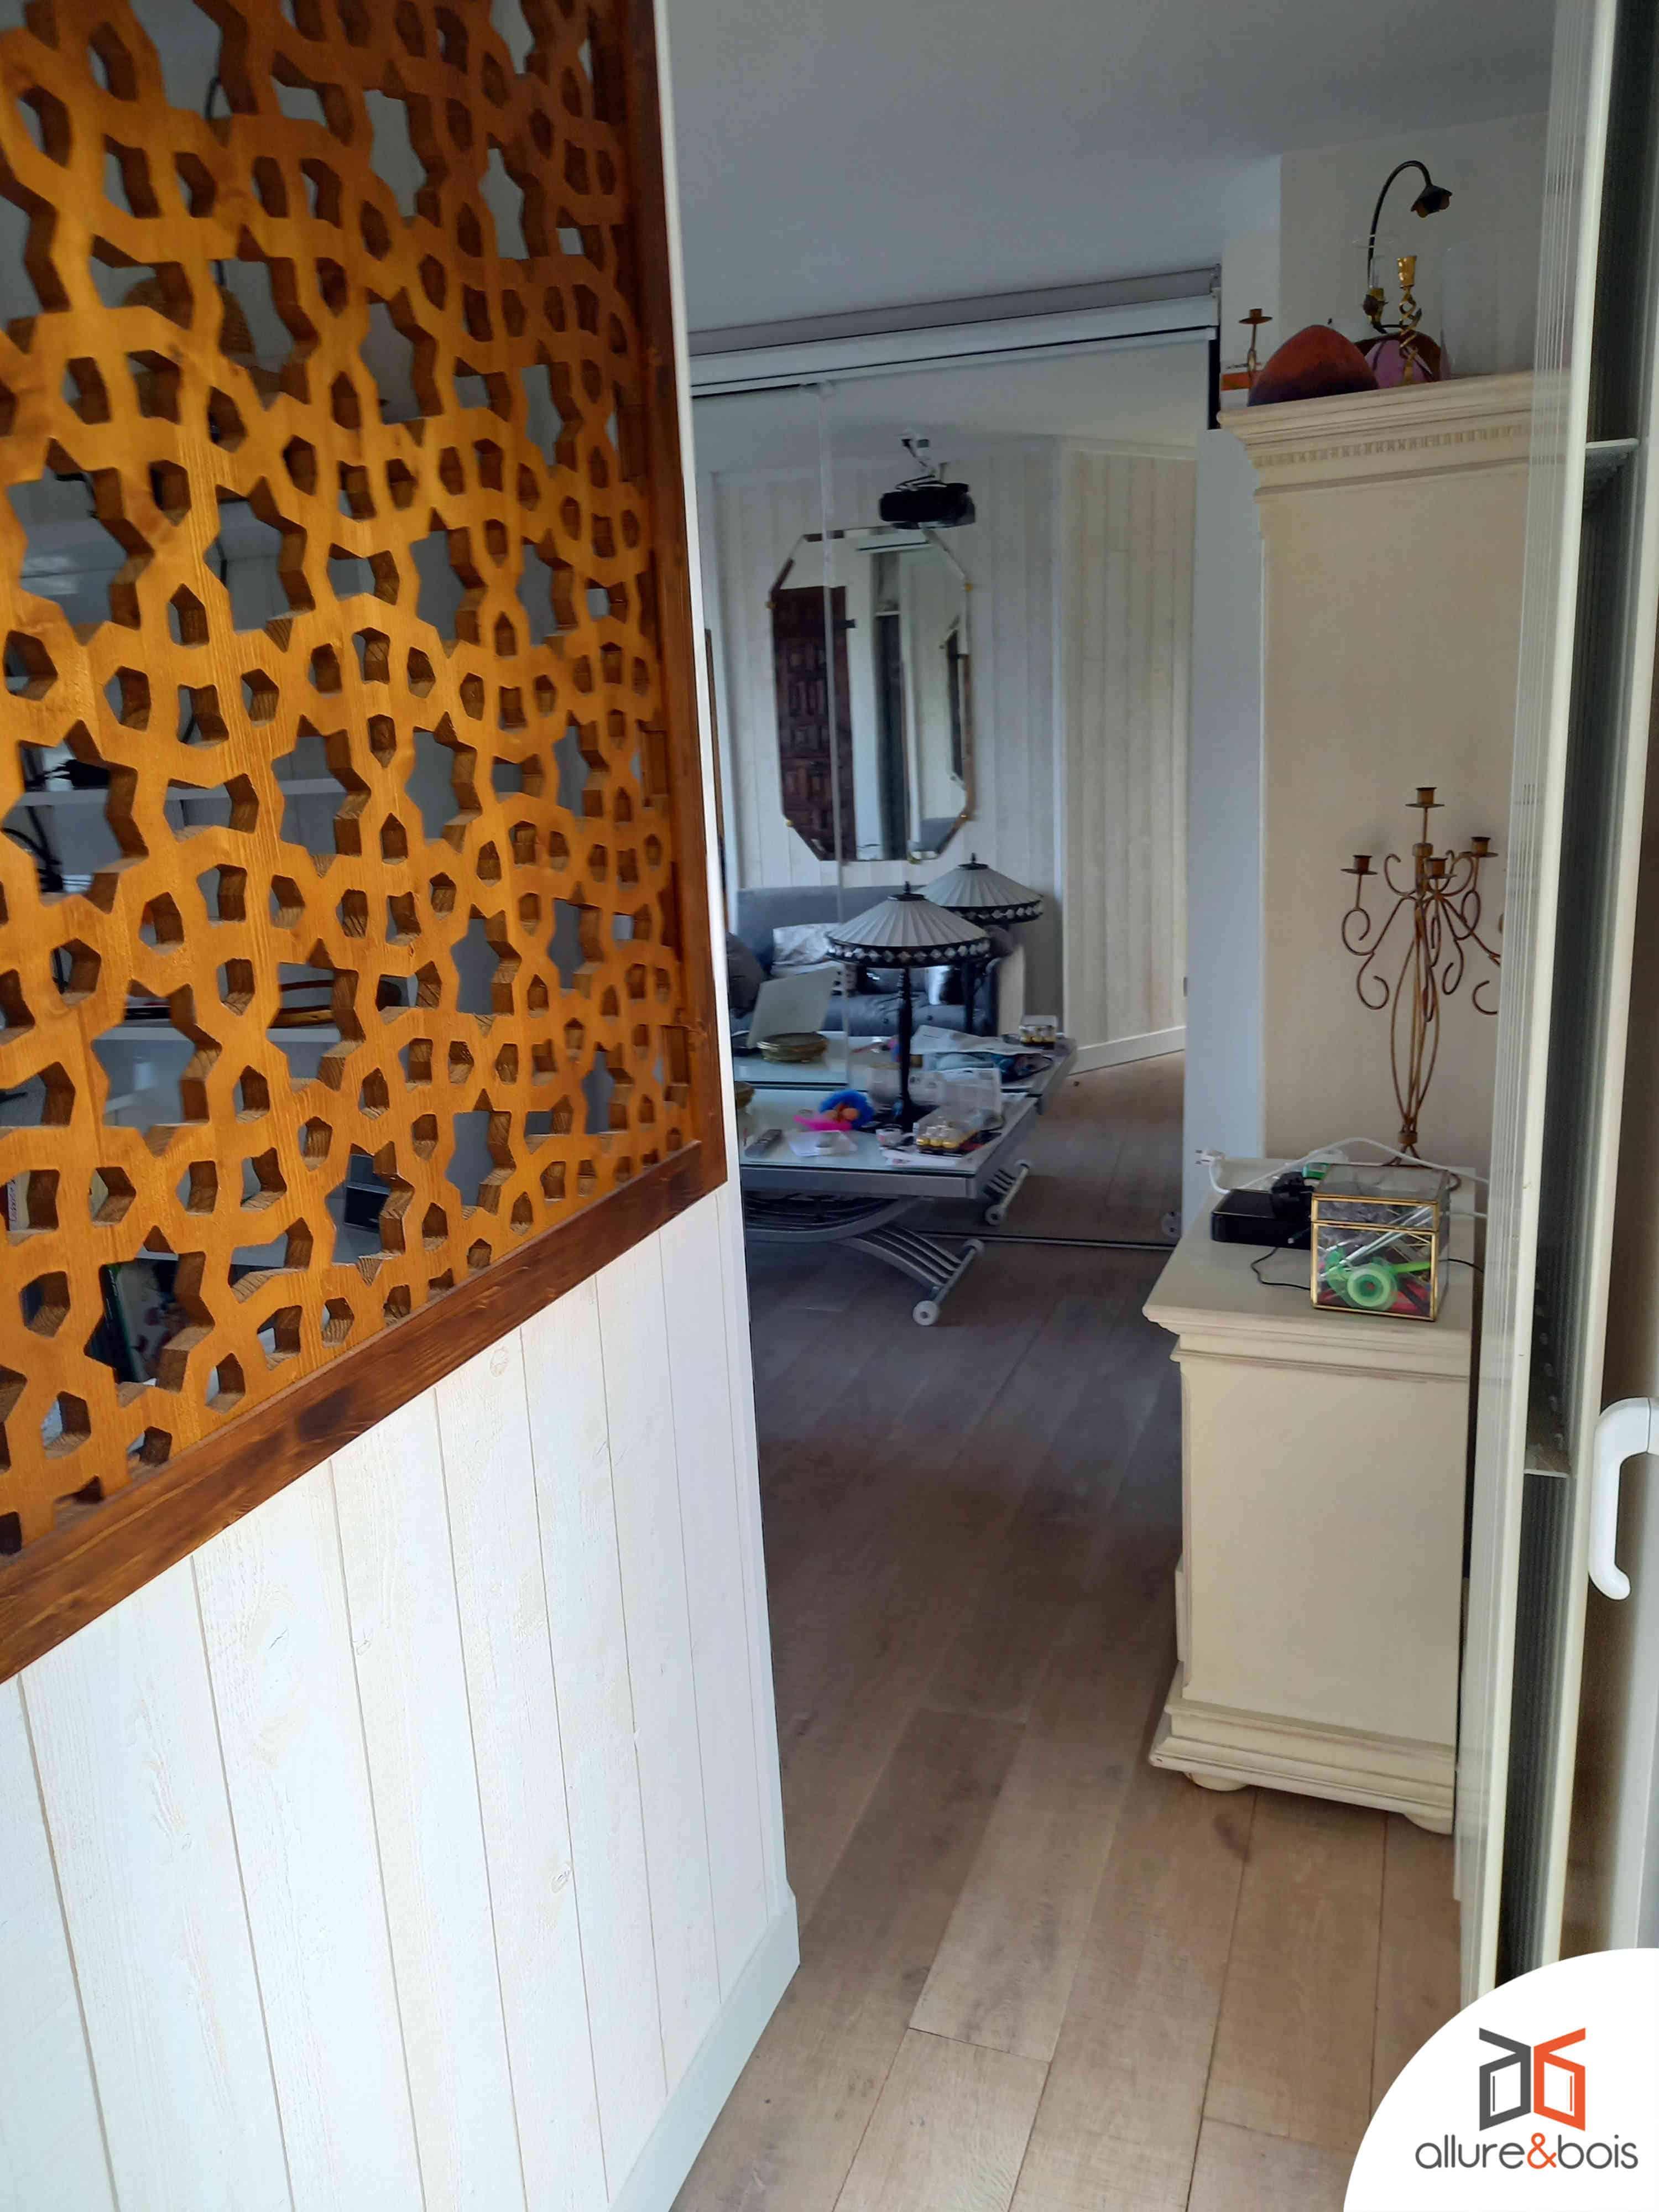 claustra bois couloir